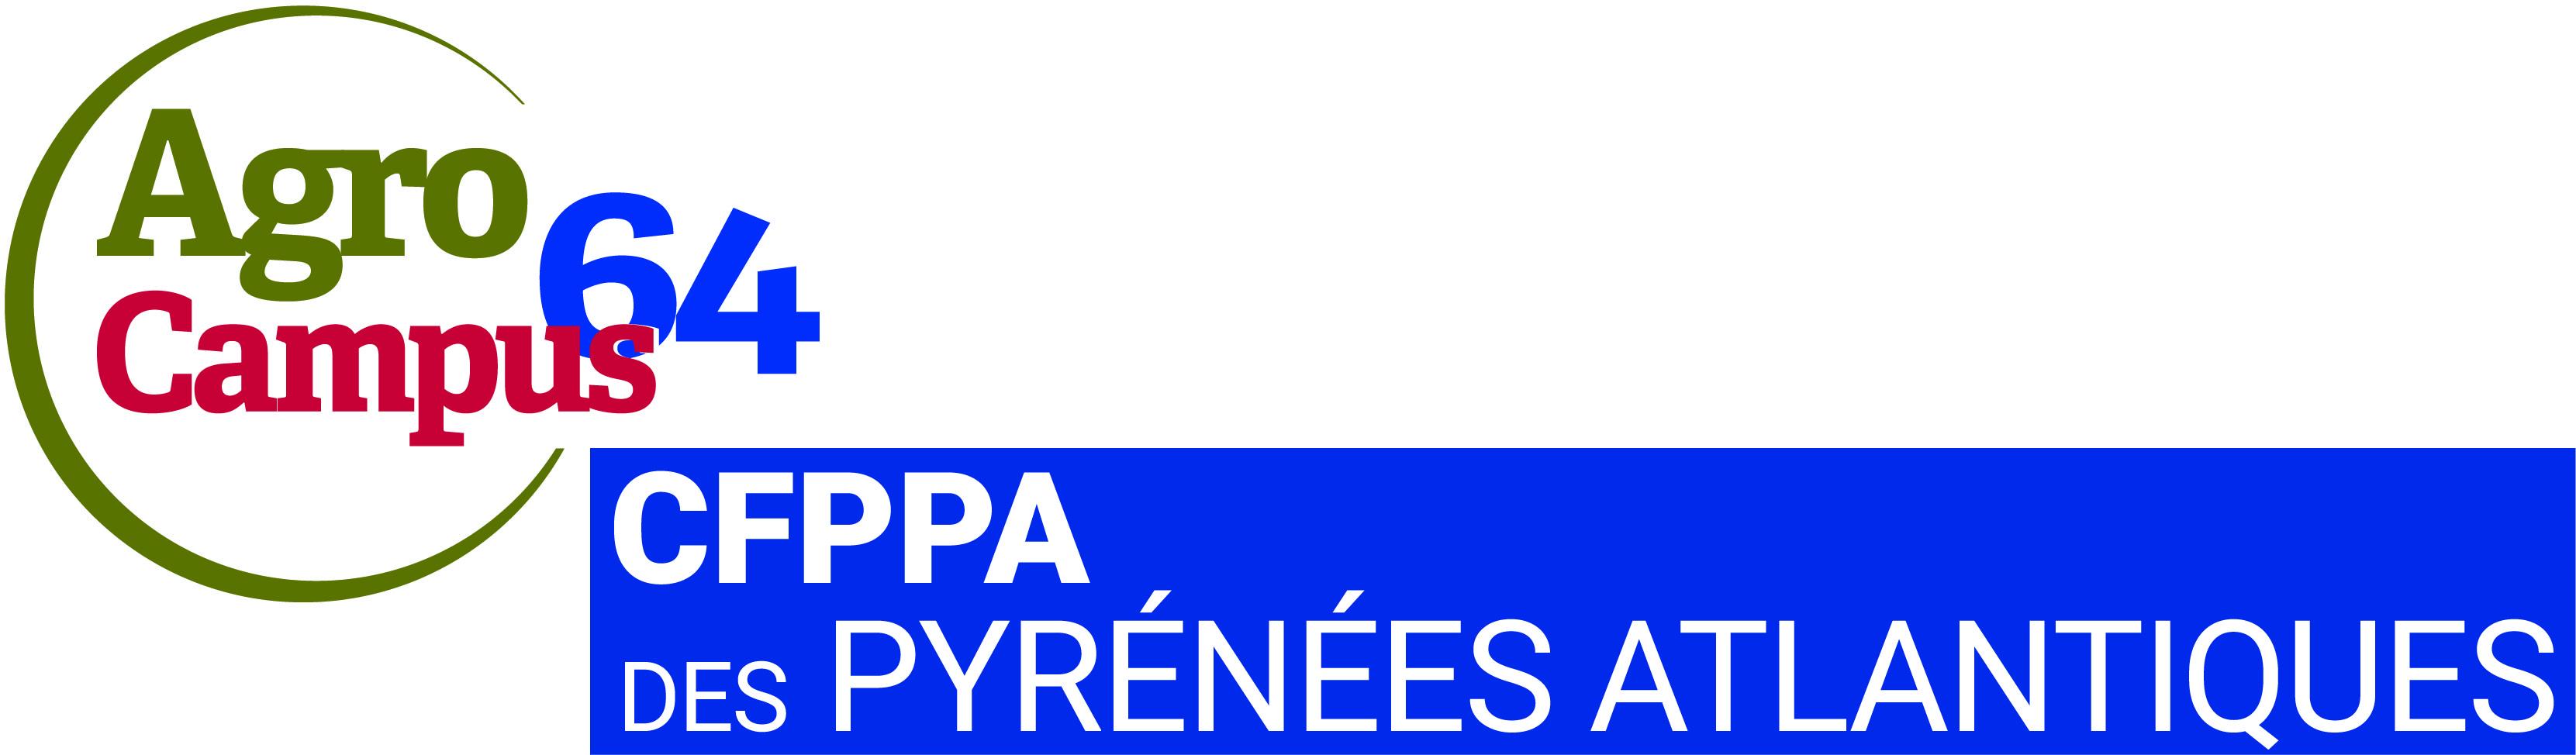 CFPPA 64